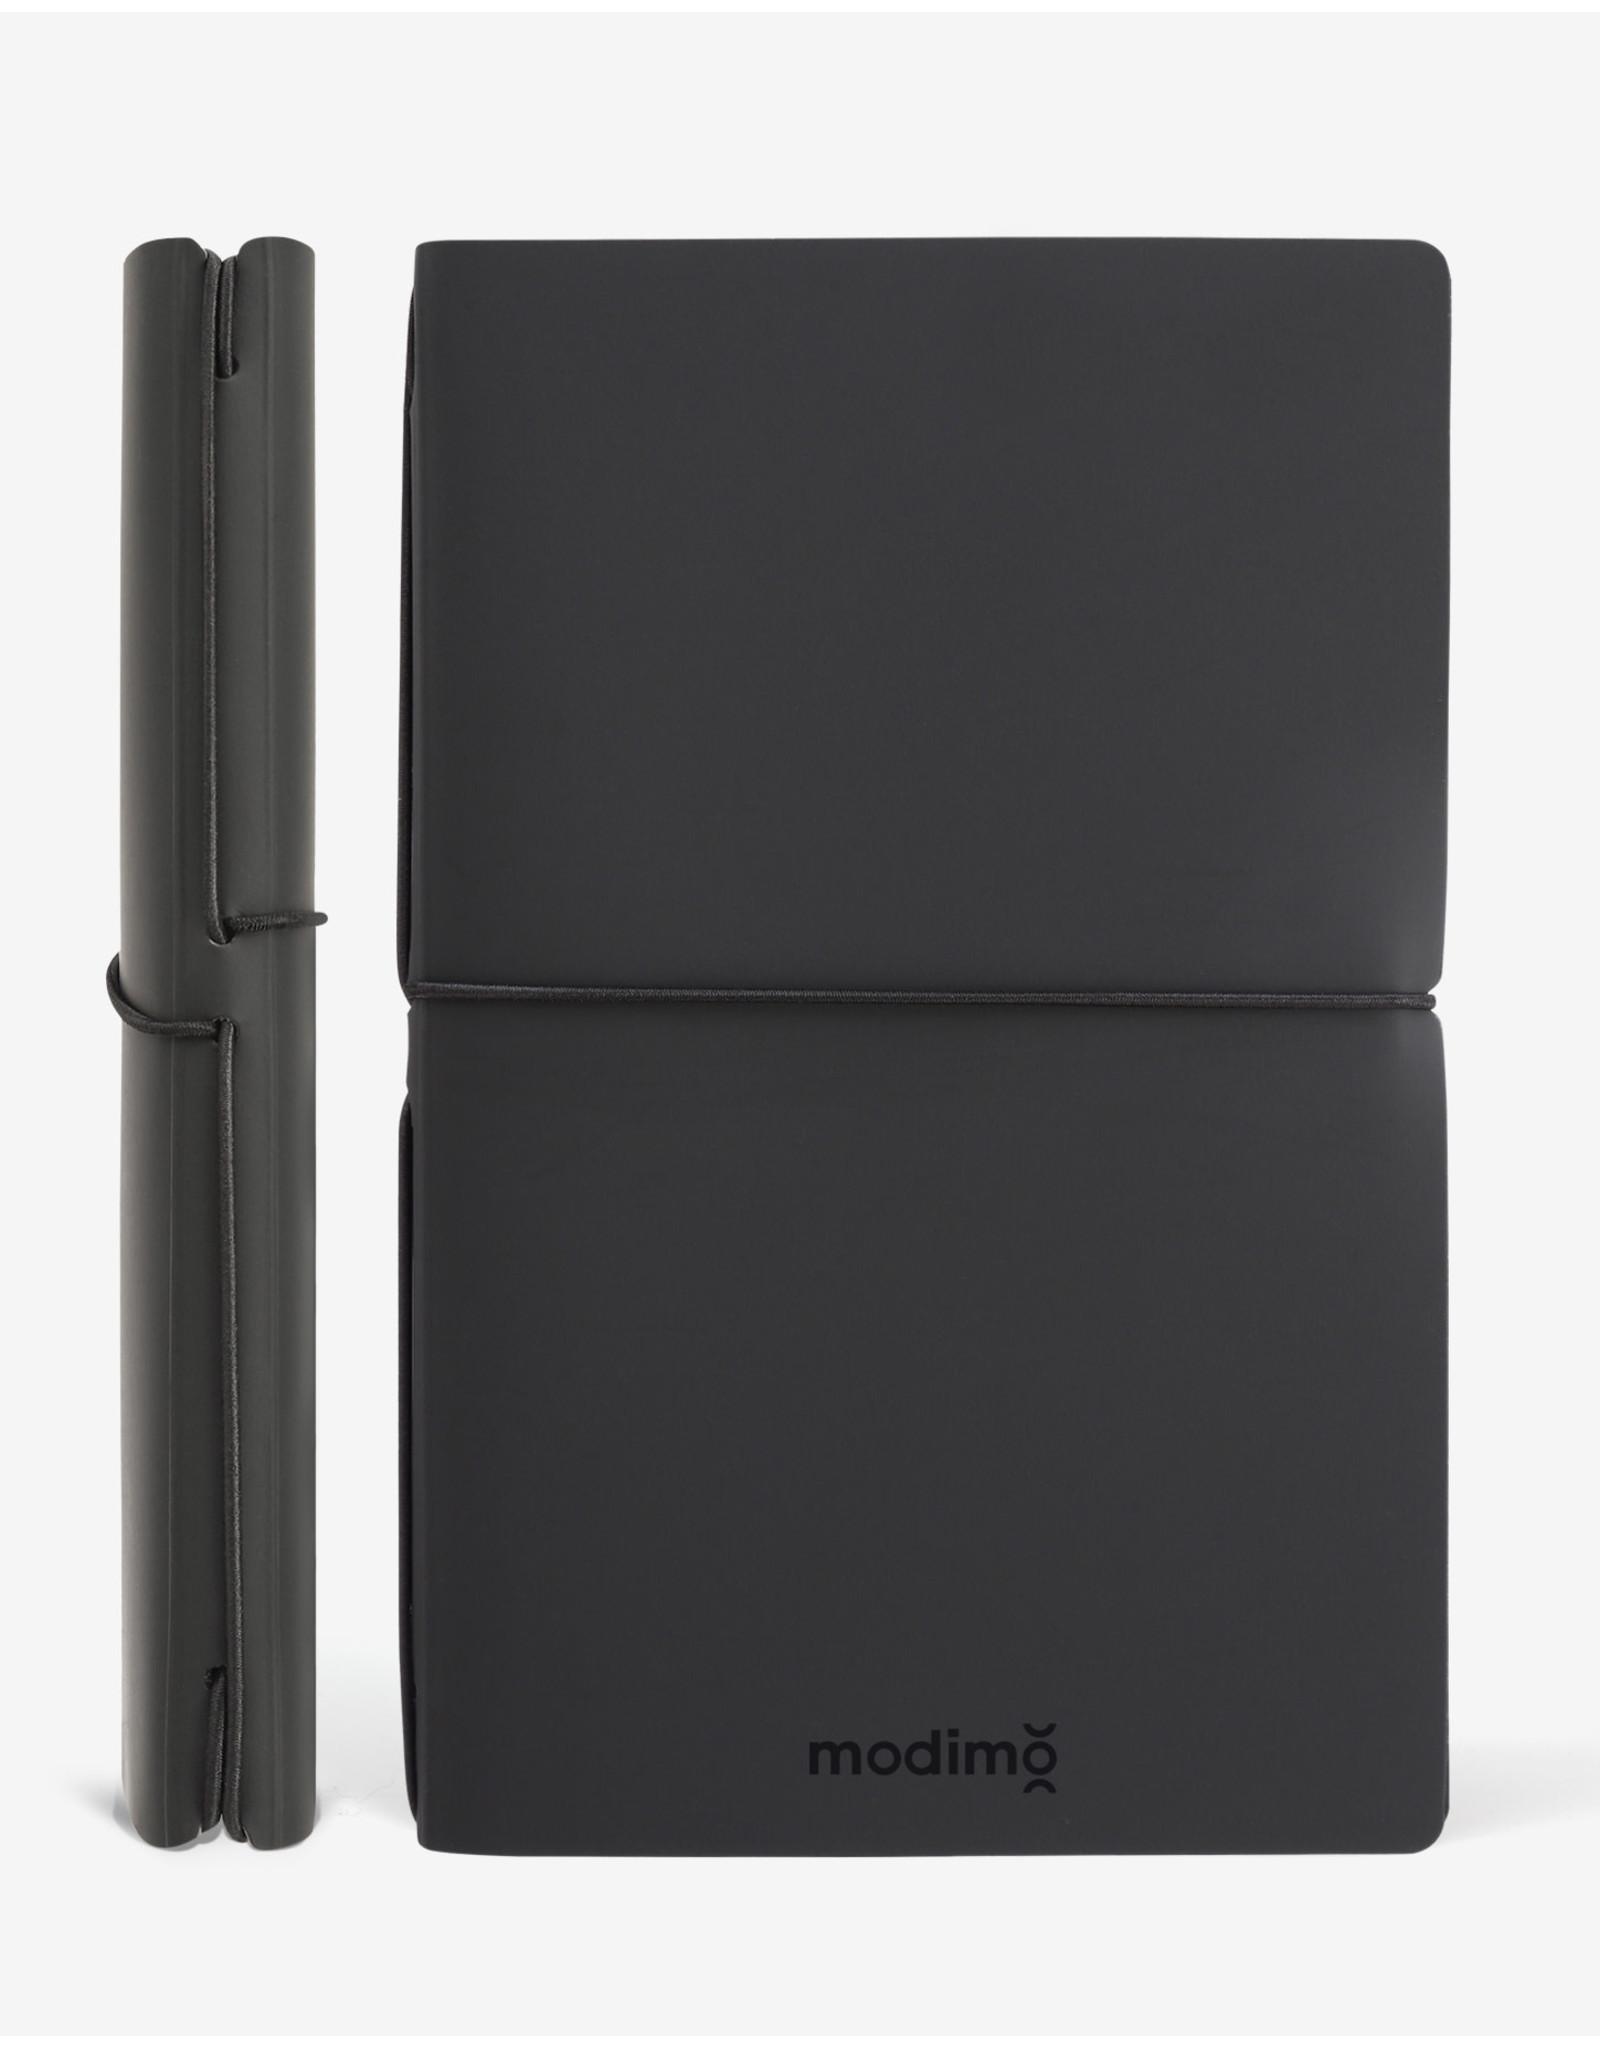 Modimo Bullet journal Black - My plan - White - 10 x 15 cm - Flexible regenerated leather